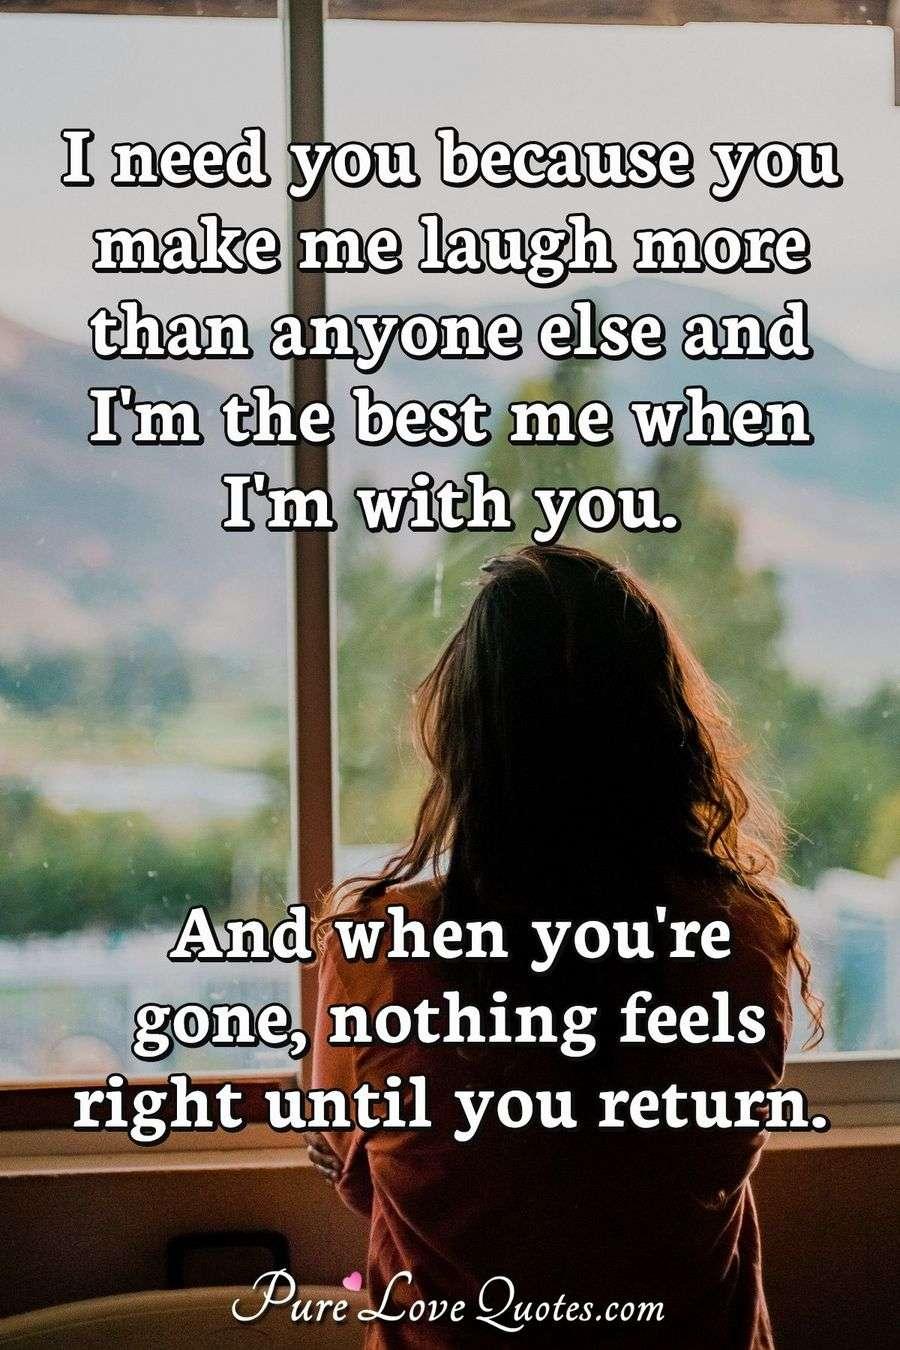 I Need You Because You Make Me Laugh More Than Anyone Else And Im